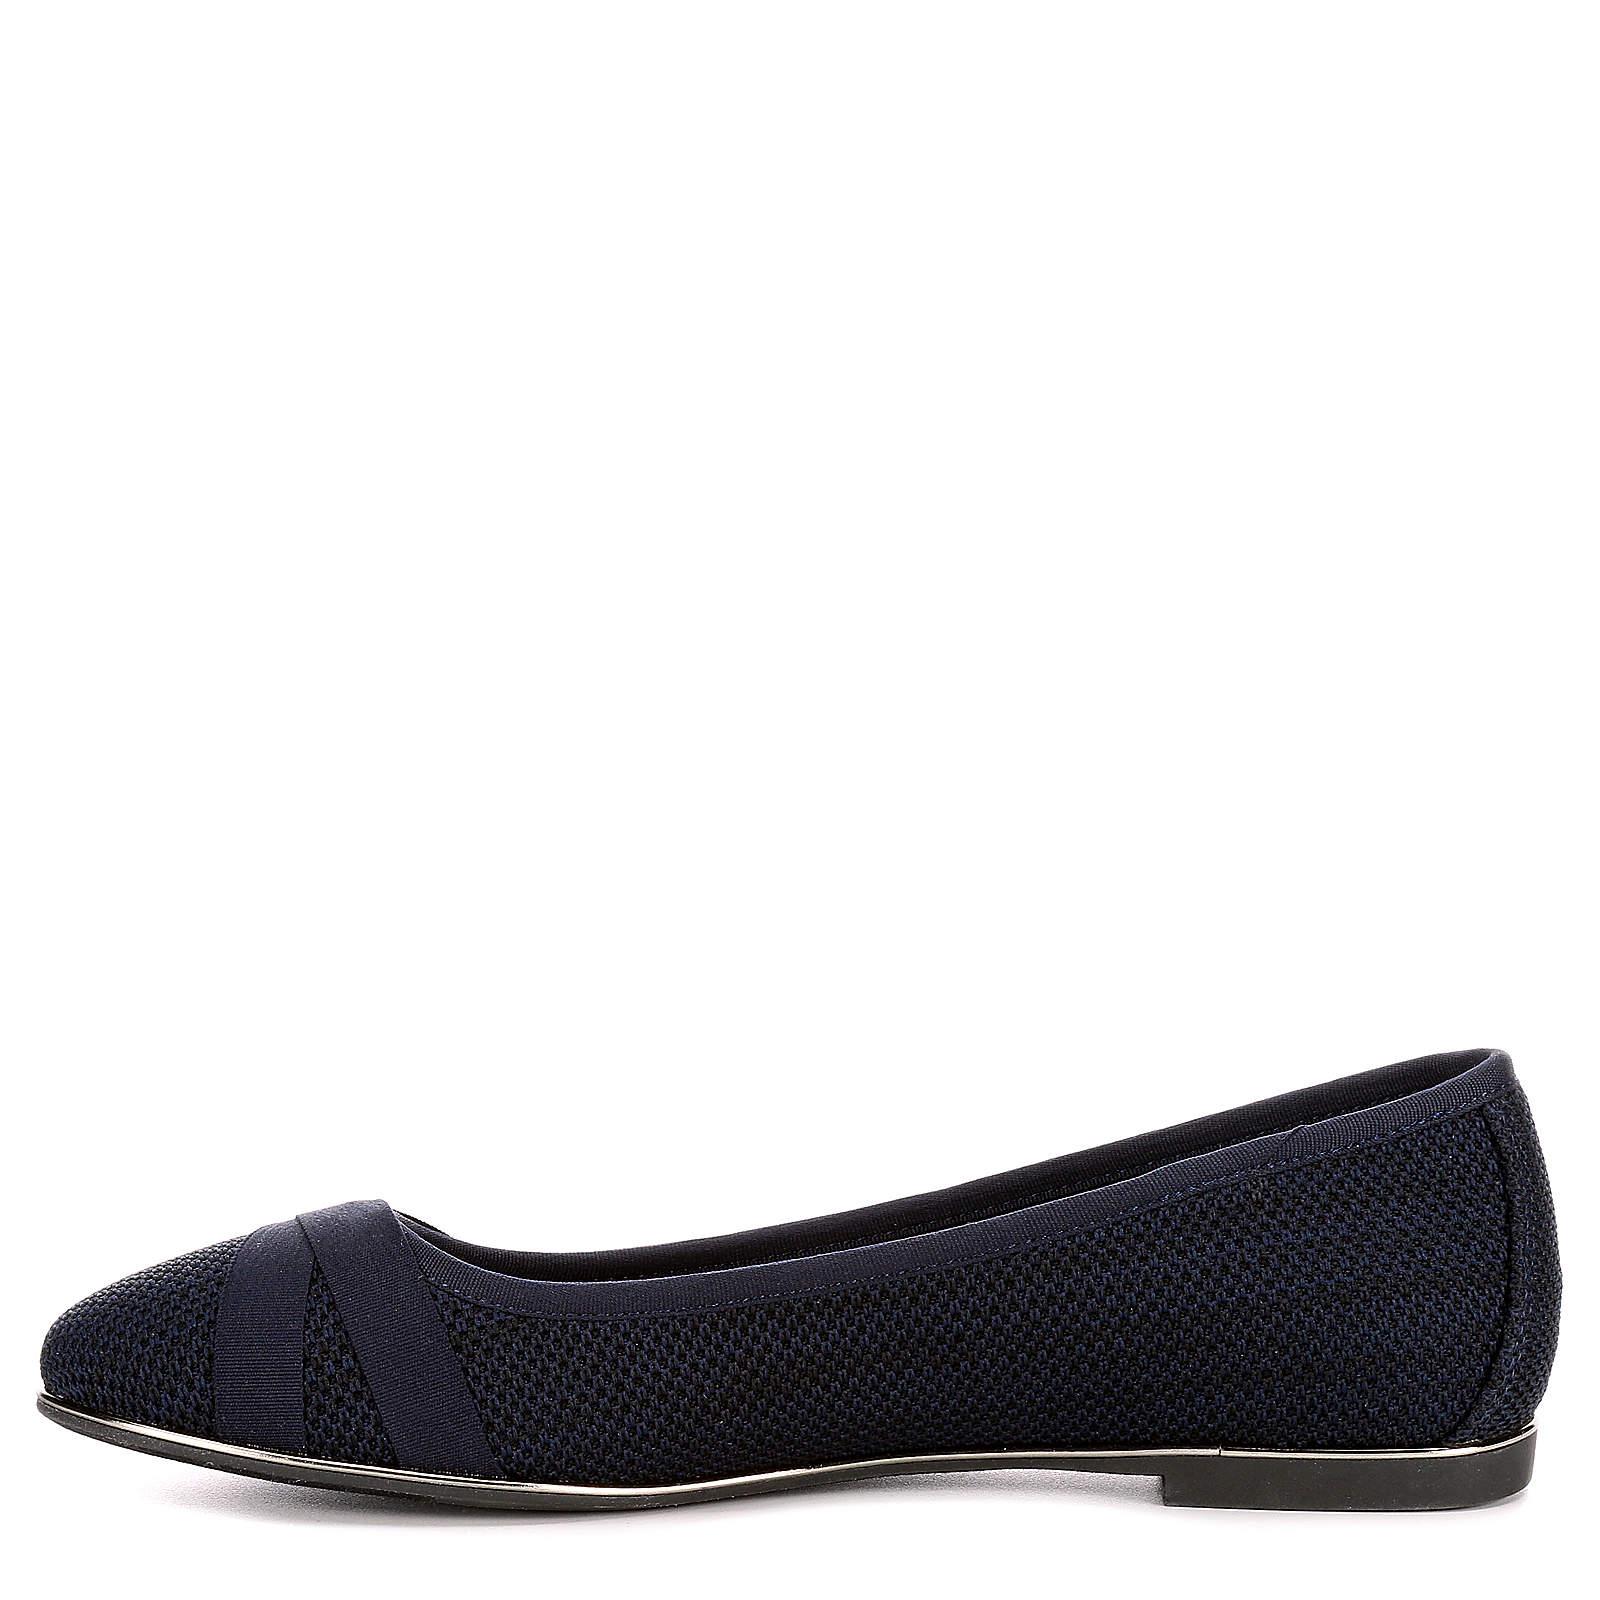 XAPPEAL-Womens-Mitzie-Slip-On-Mesh-Flat-Shoes thumbnail 5